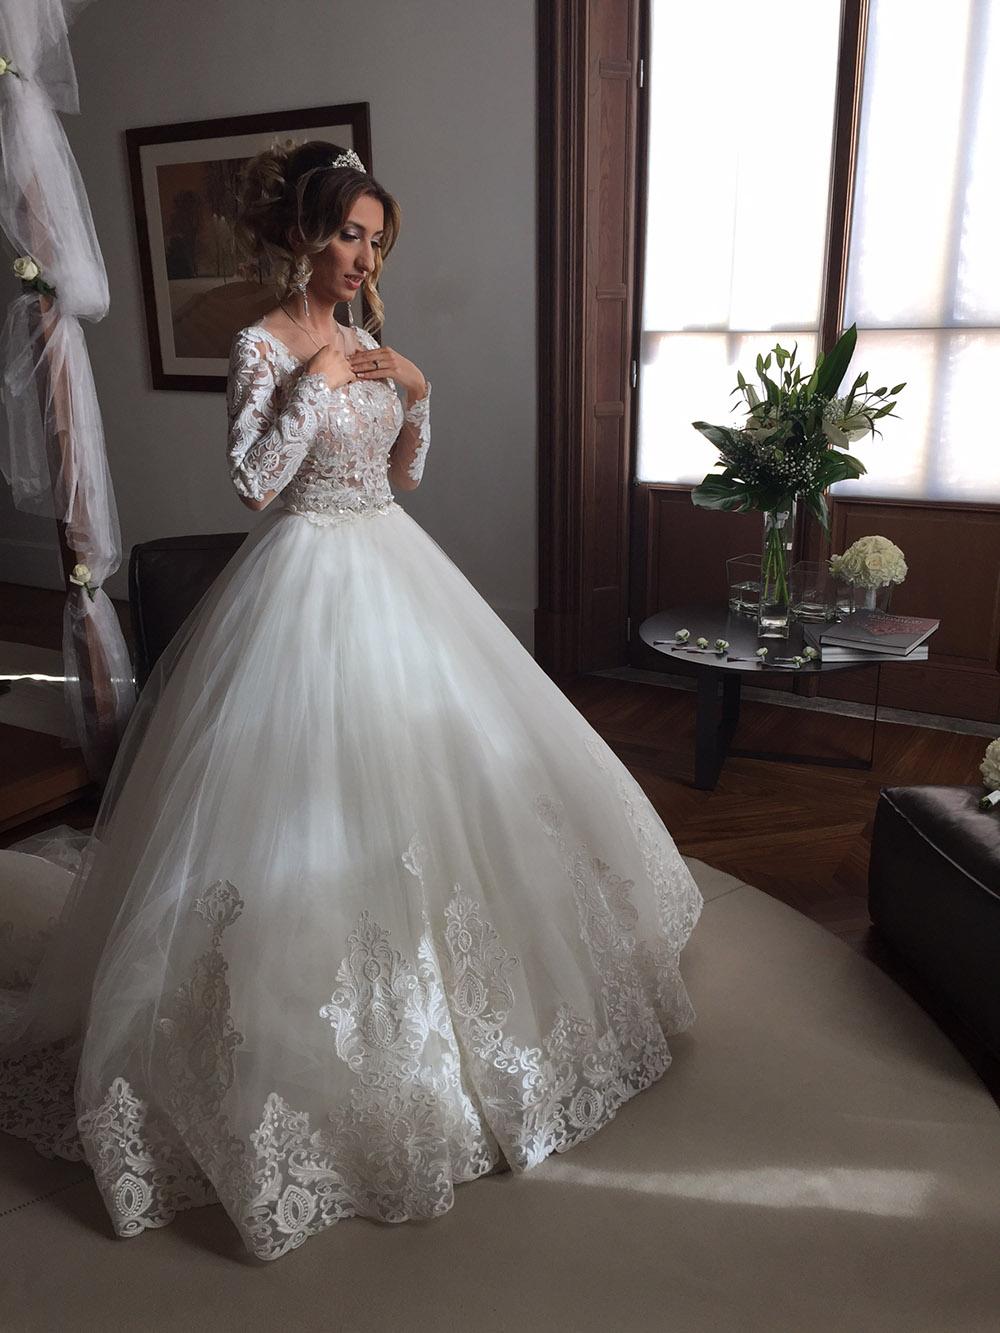 7-armenian-italian-wedding-in-rome-annartstyle-news.JPG